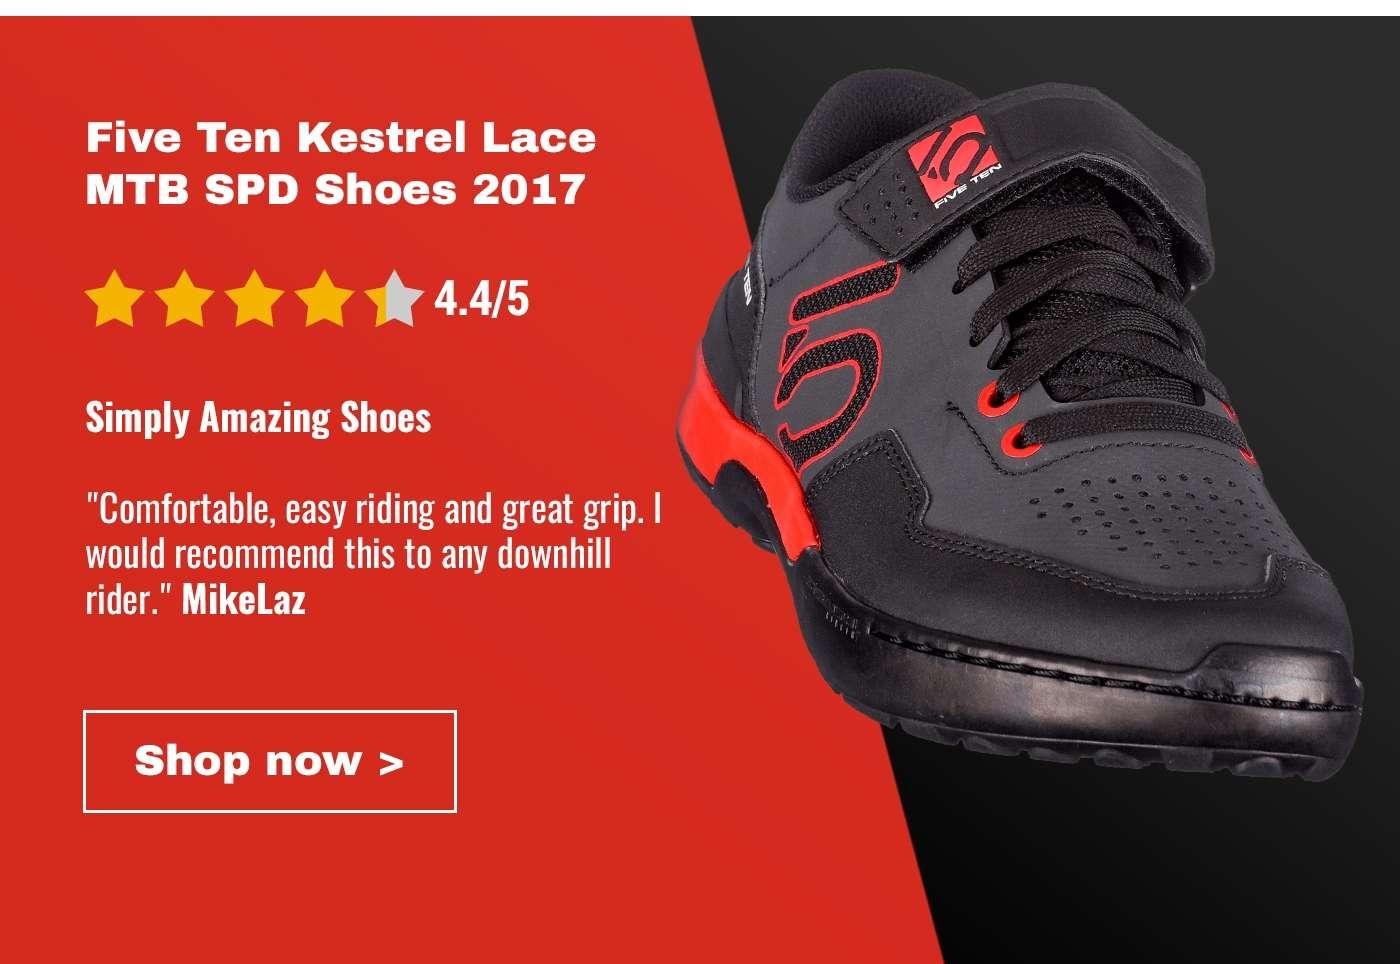 Five Ten Kestrel Lace MTB SPD Shoes 2017